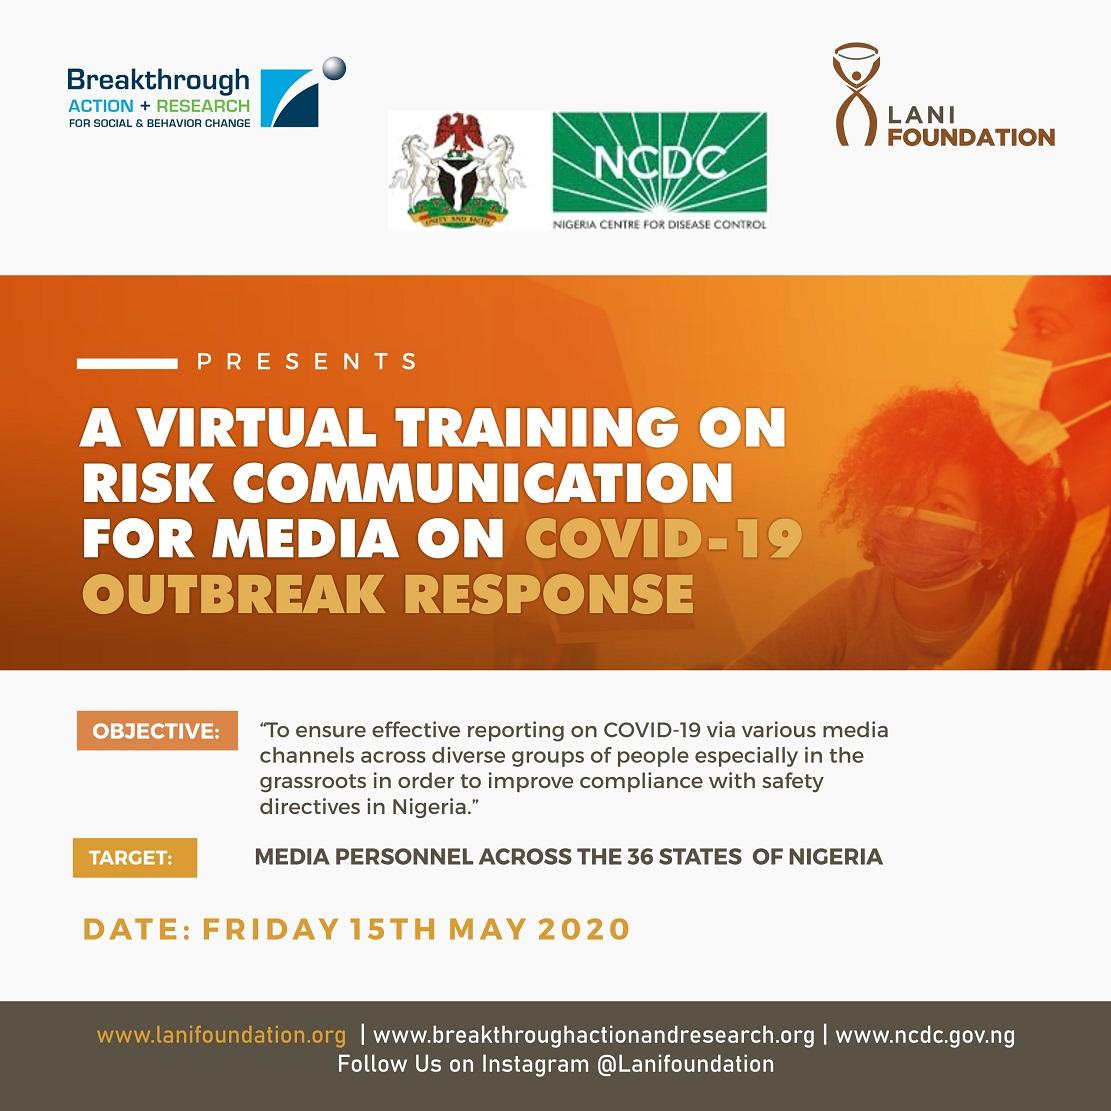 Virtual Training on Risk Communication for Media on COVID-19 Outbreak Response